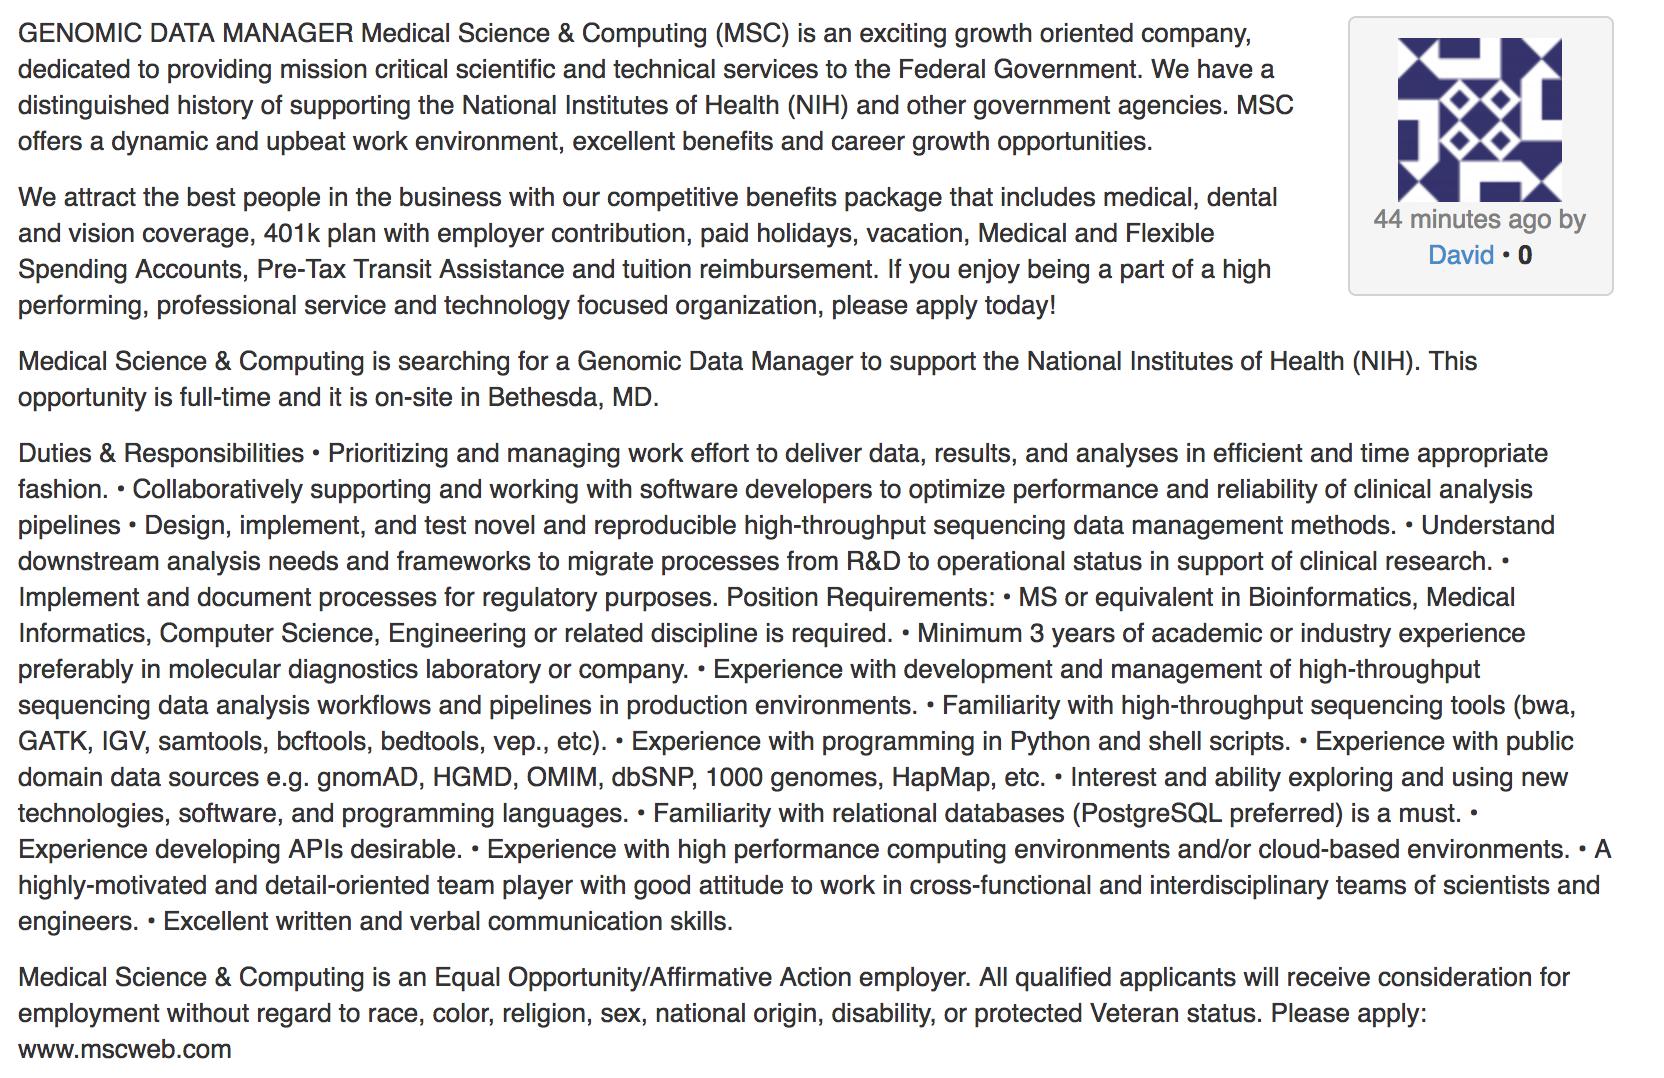 Genomics Data Manager, Medical Science & Computing (MSC